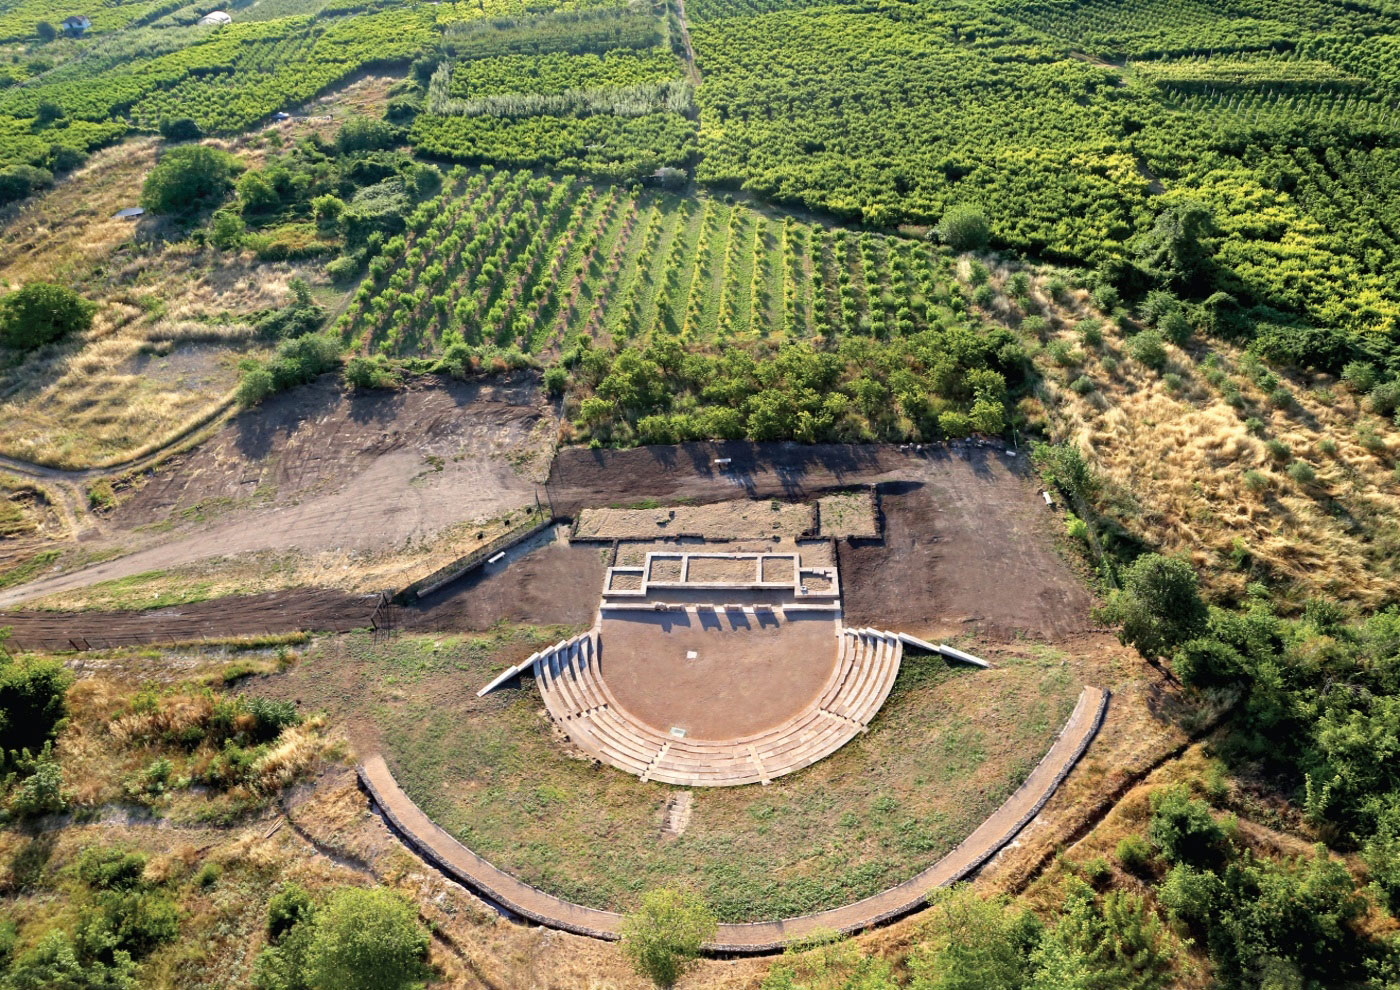 Tο Αρχαίο Θέατρο της Μίεζας ανοίγει για το κοινό